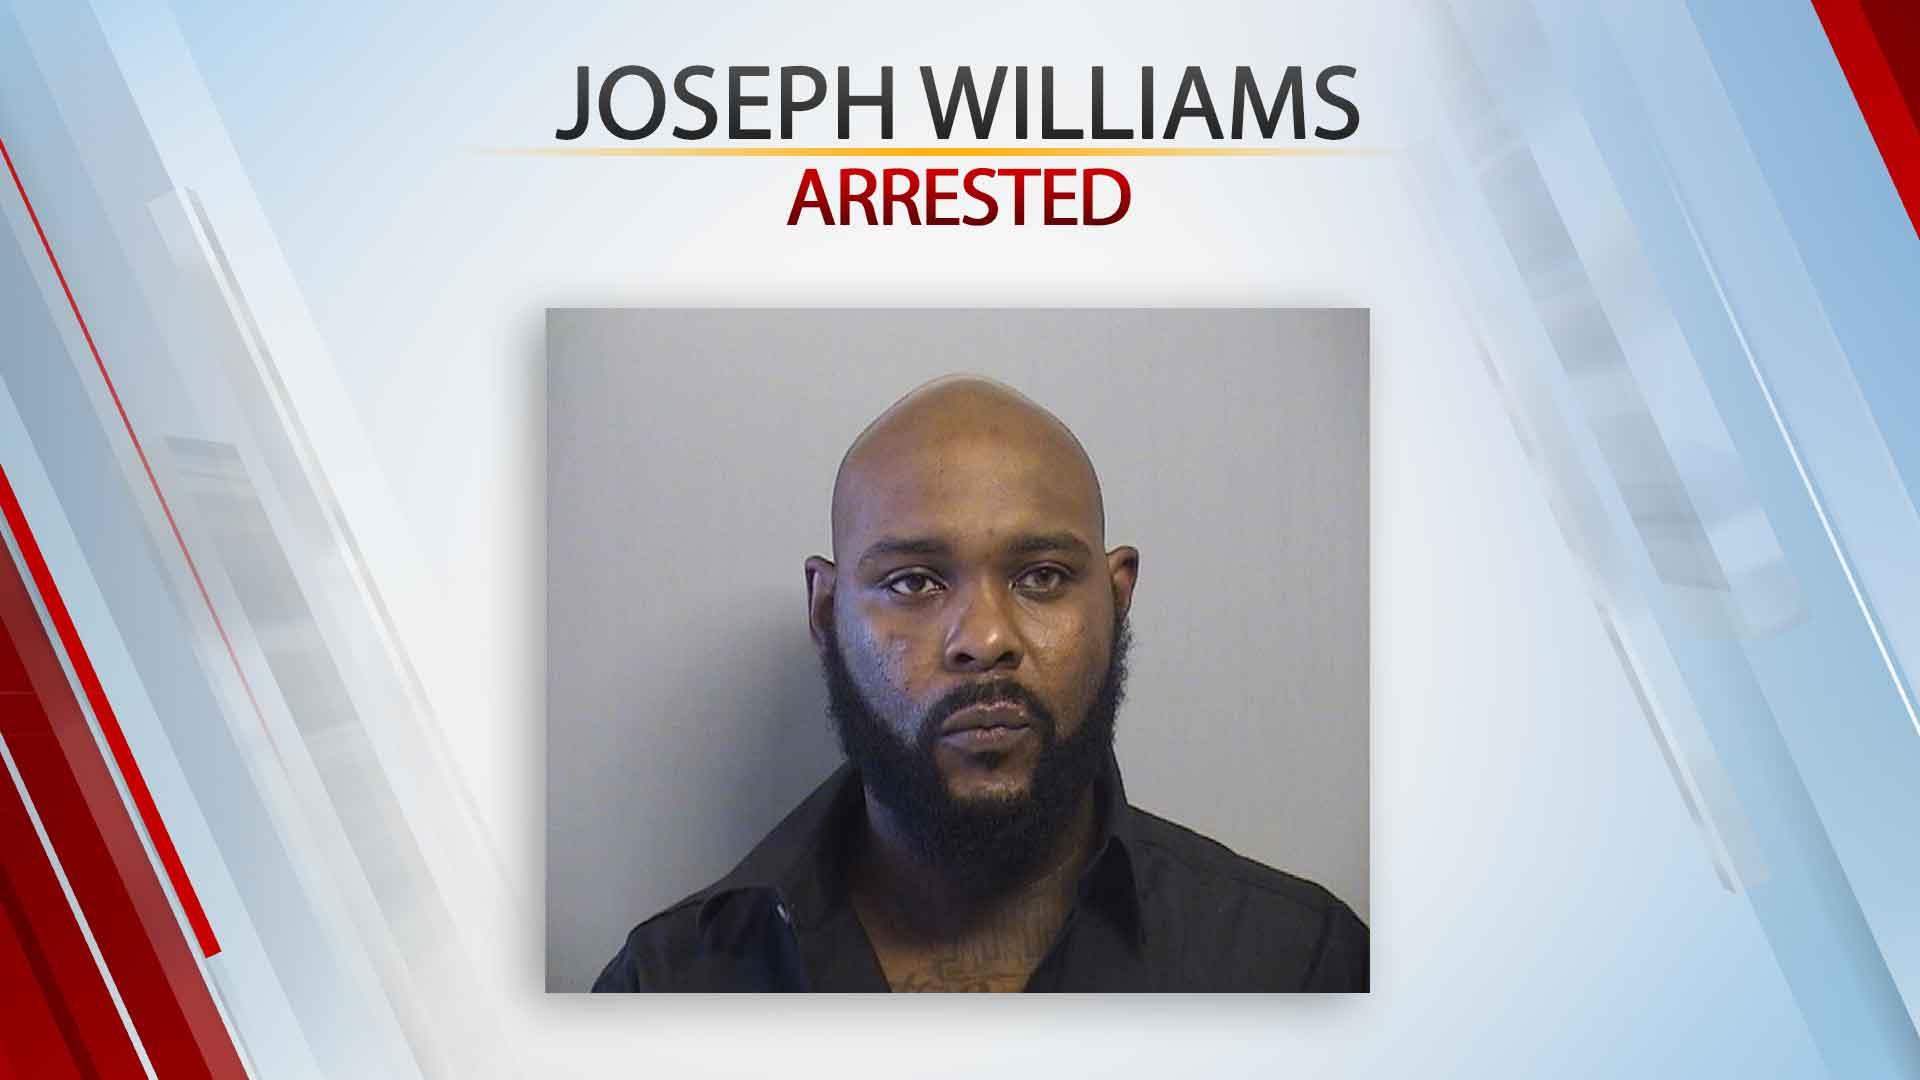 Joseph Williams (mug)